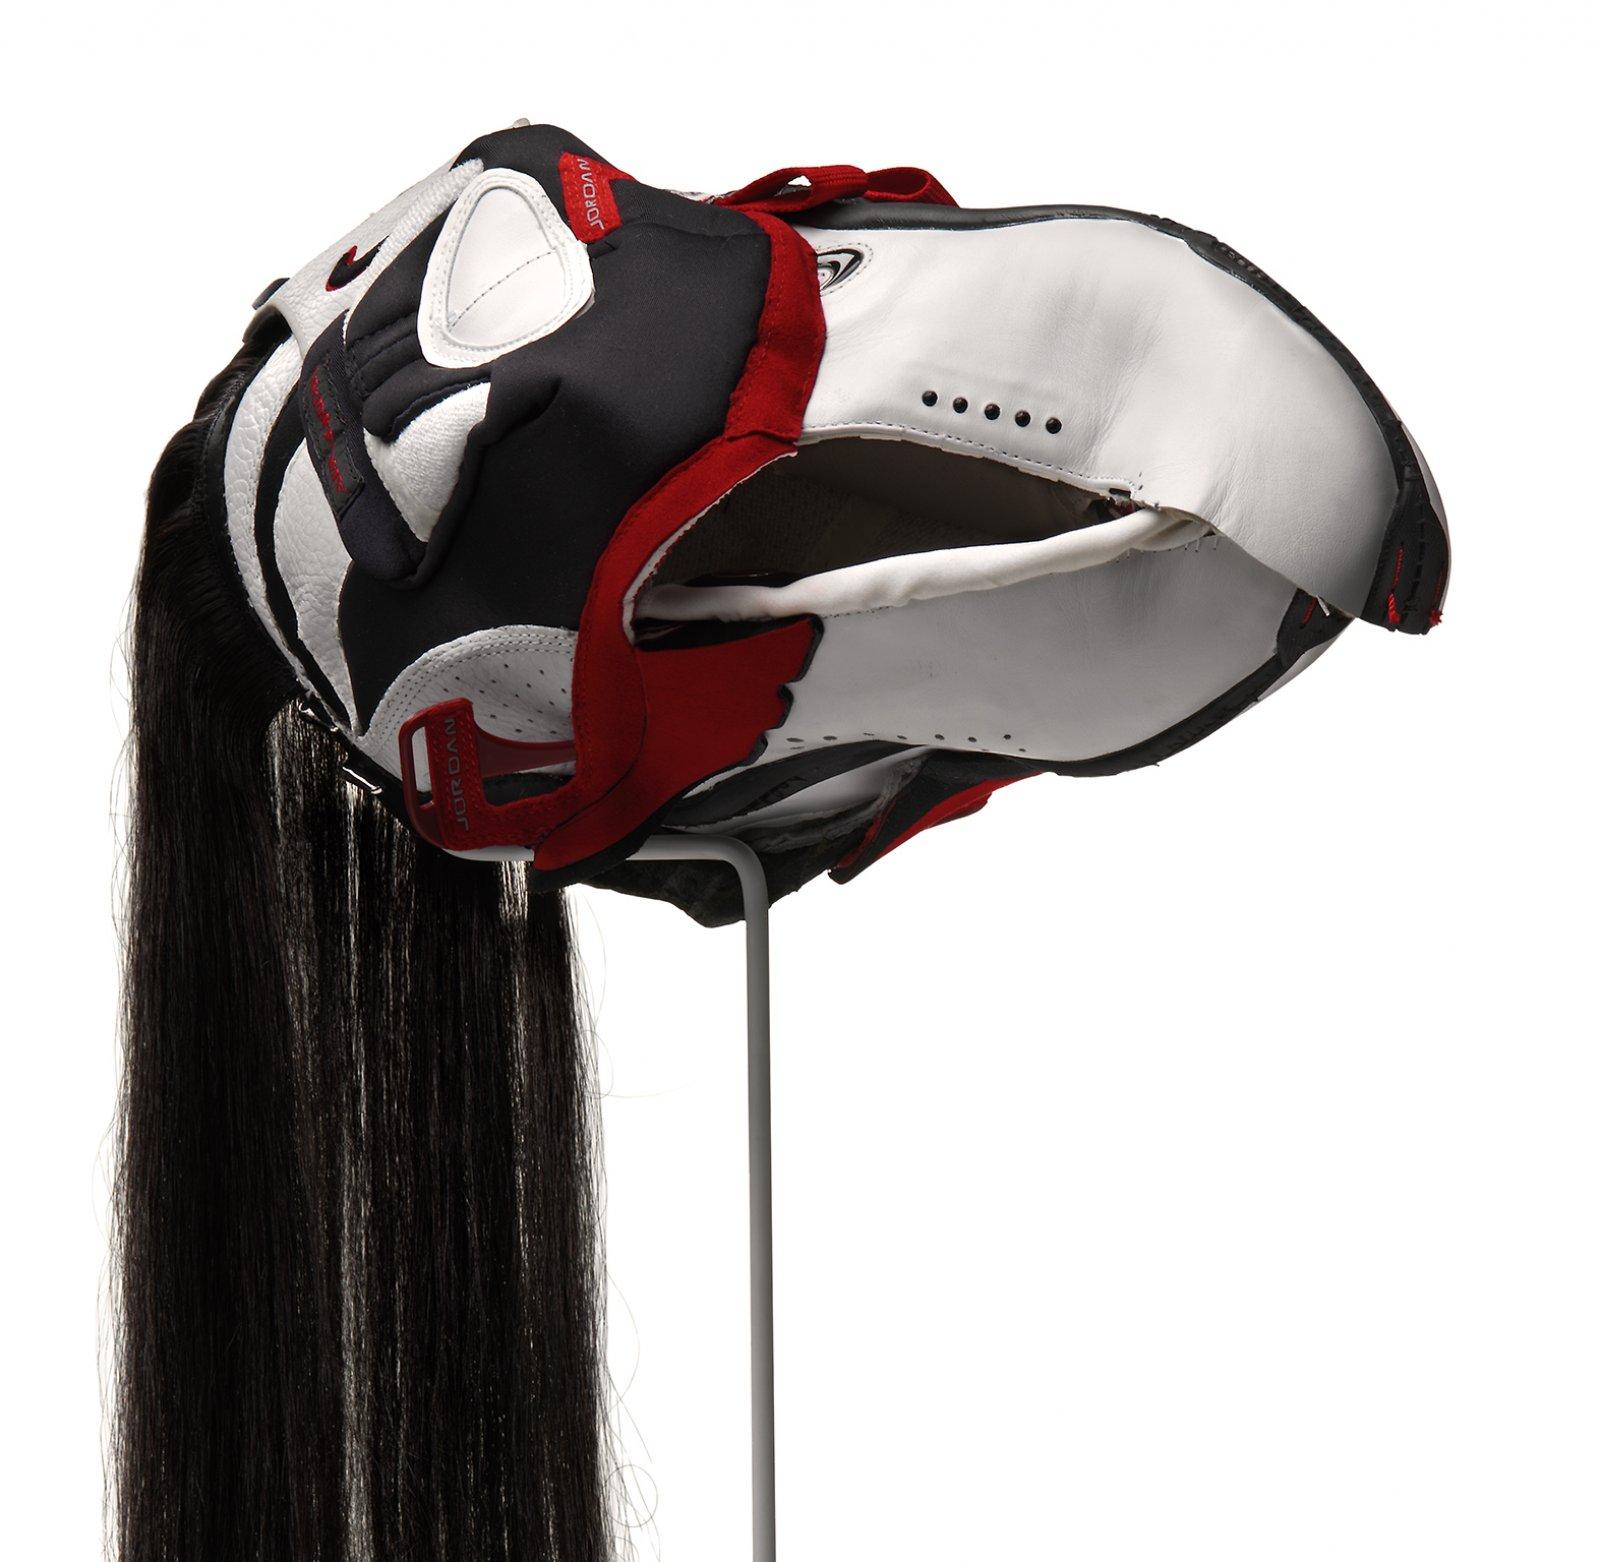 Brian Jungen,Prototype for New Understanding #13(detail), 2003, nike air jordans, human hair, 25 x 9 x 15 in. (64 x 24 x 39 cm)